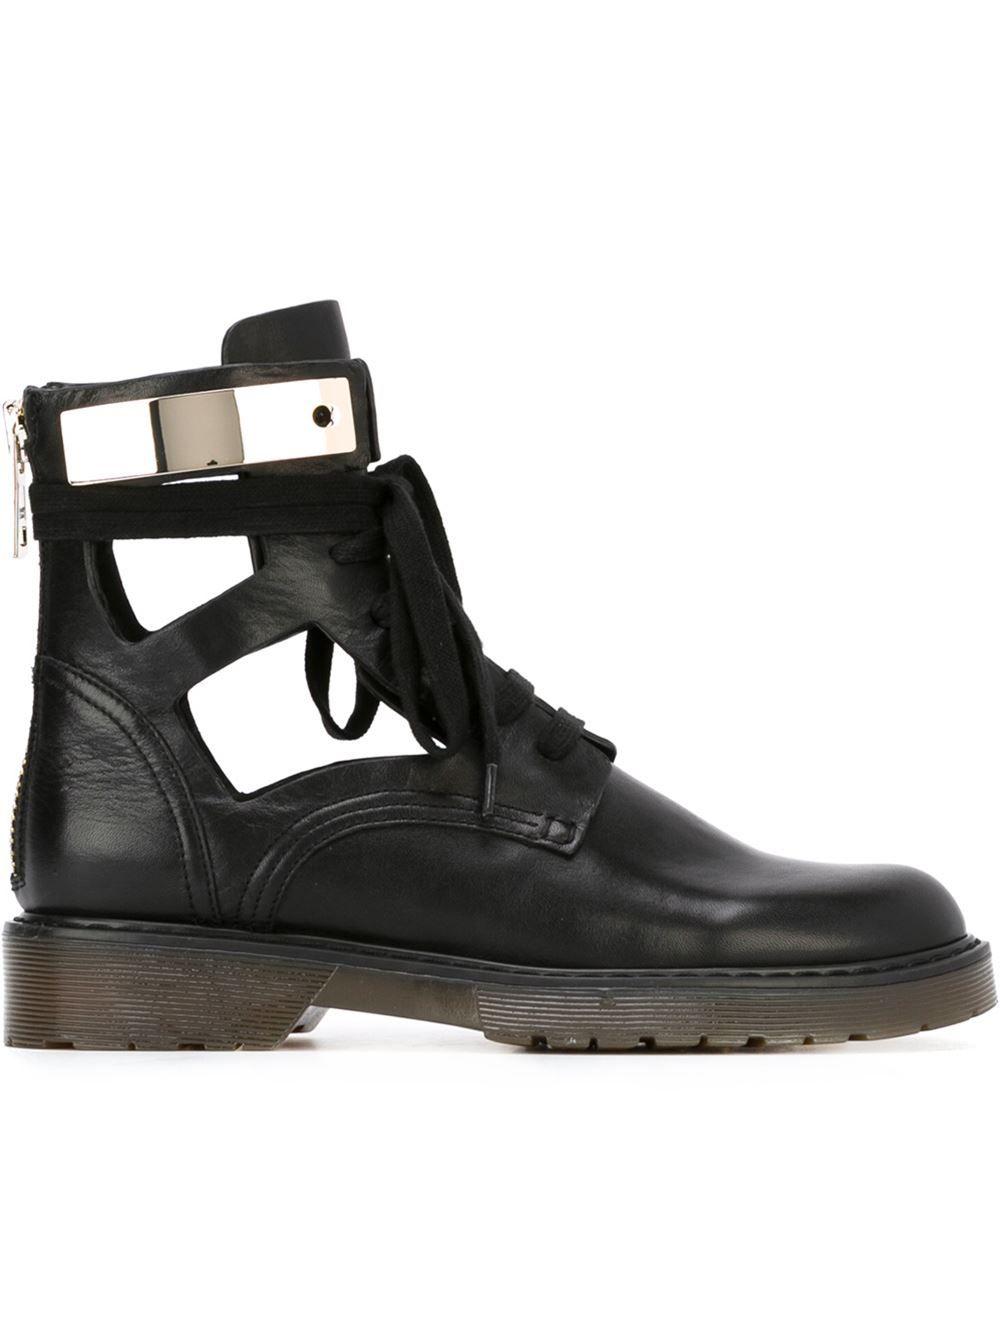 ab8d2ec47 See By Chloé Cut-out Combat Boots - Deliberti - Farfetch.com   pin ...